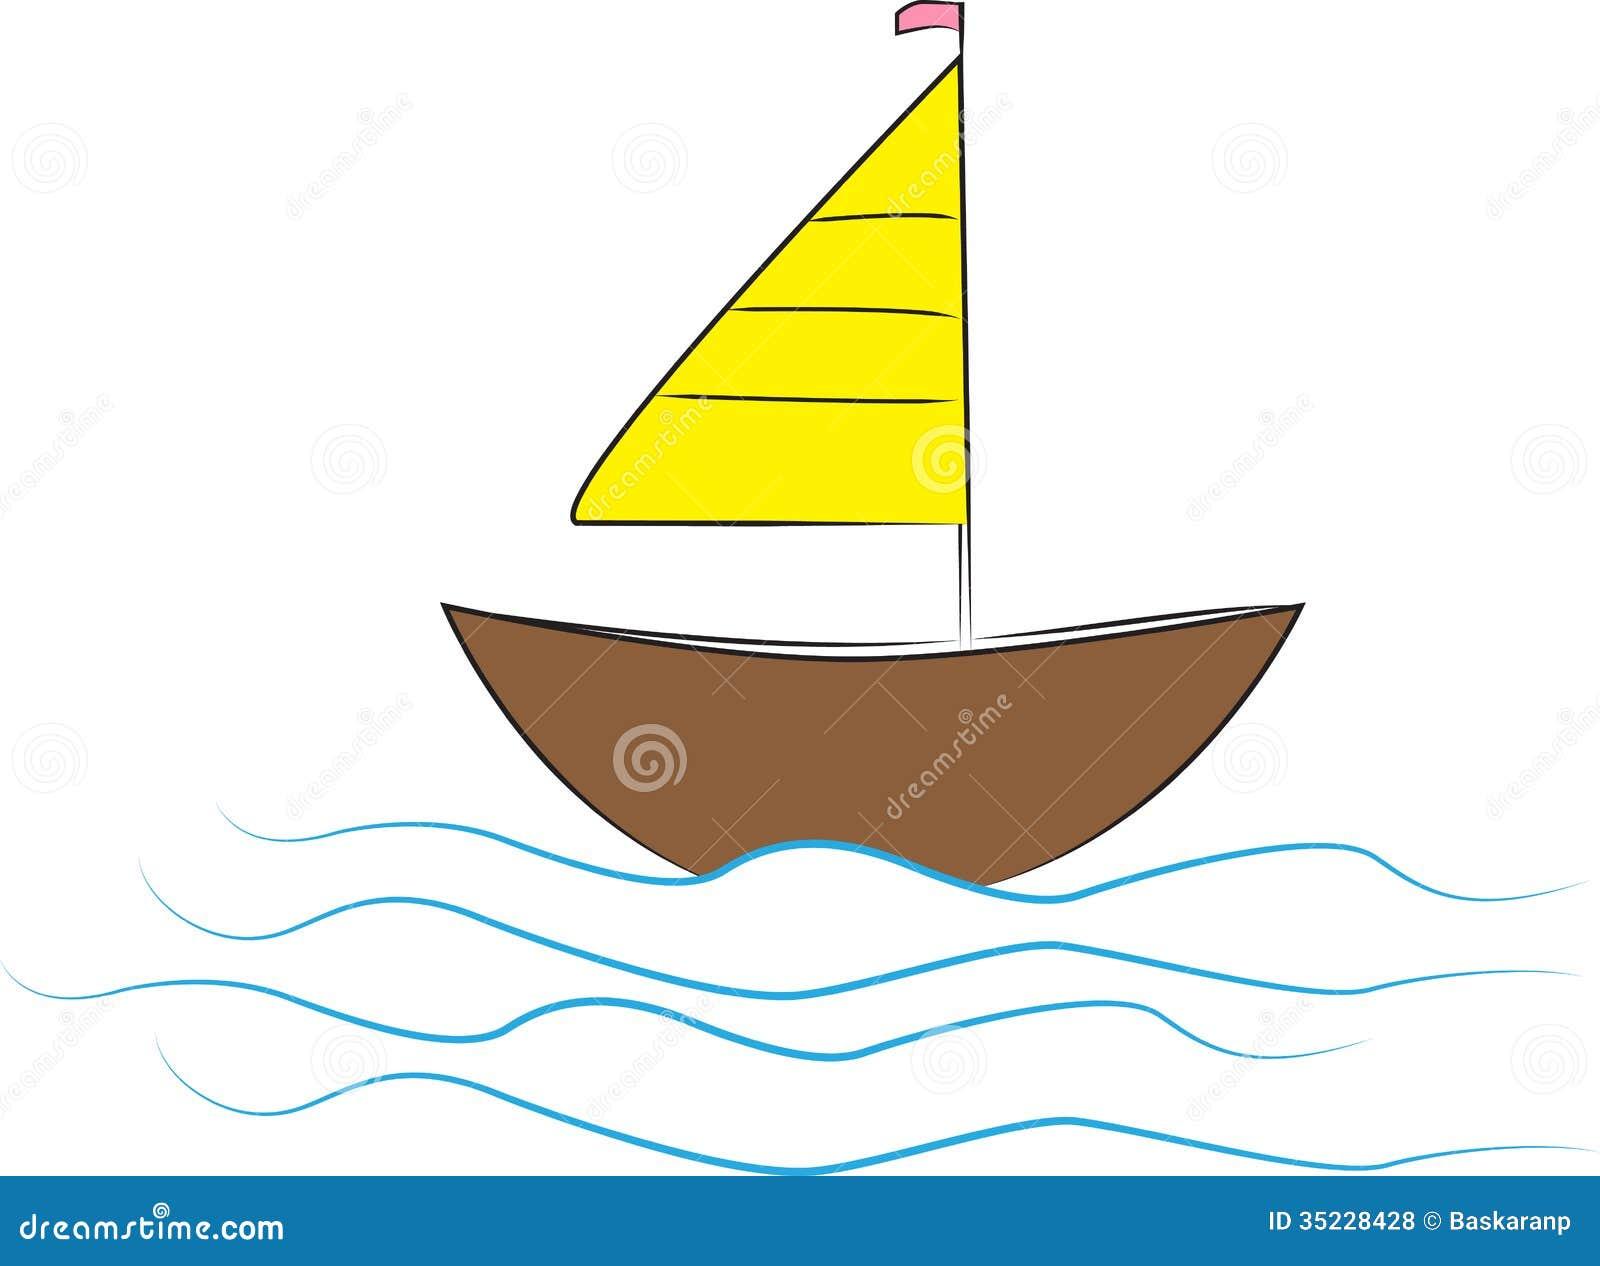 Illustration of boat design isolated on white background.